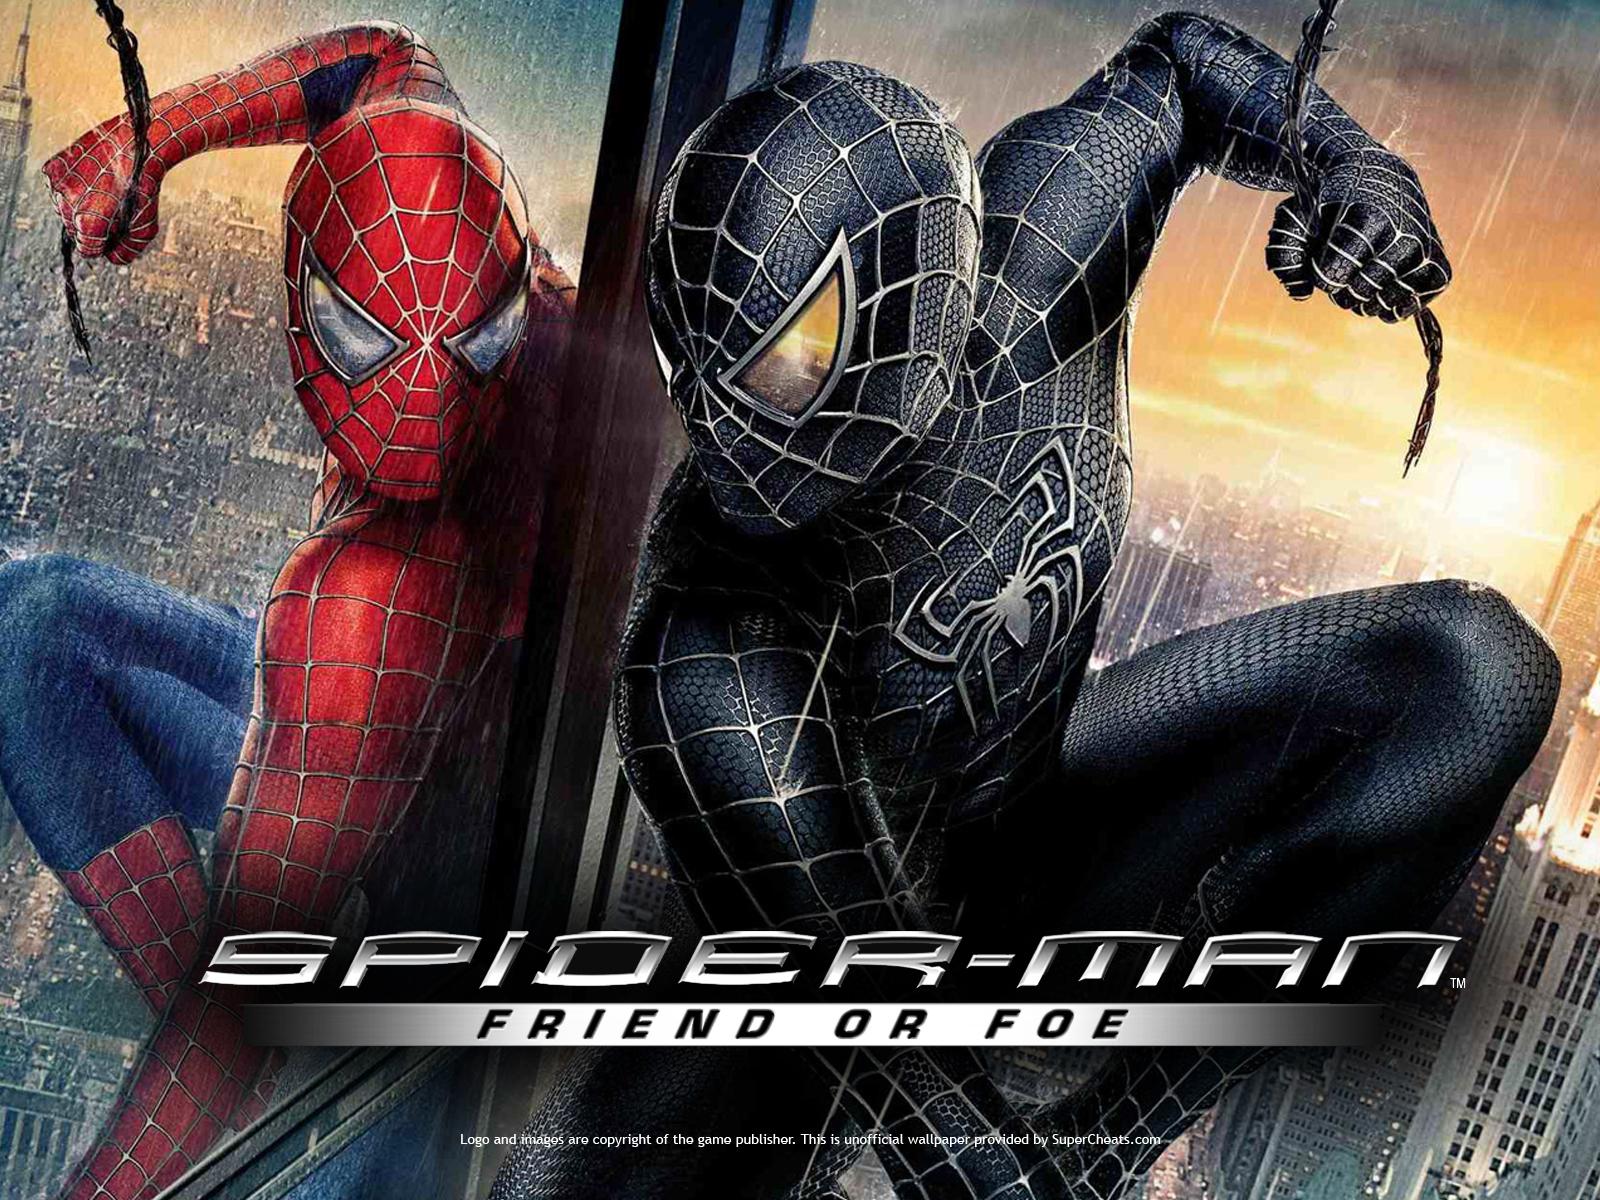 http://3.bp.blogspot.com/-lg97gBcKlYg/TcOvcYYXIxI/AAAAAAAAAV4/fcf3wMTPld0/s1600/Spiderman+Friend+Or+Foe.jpg